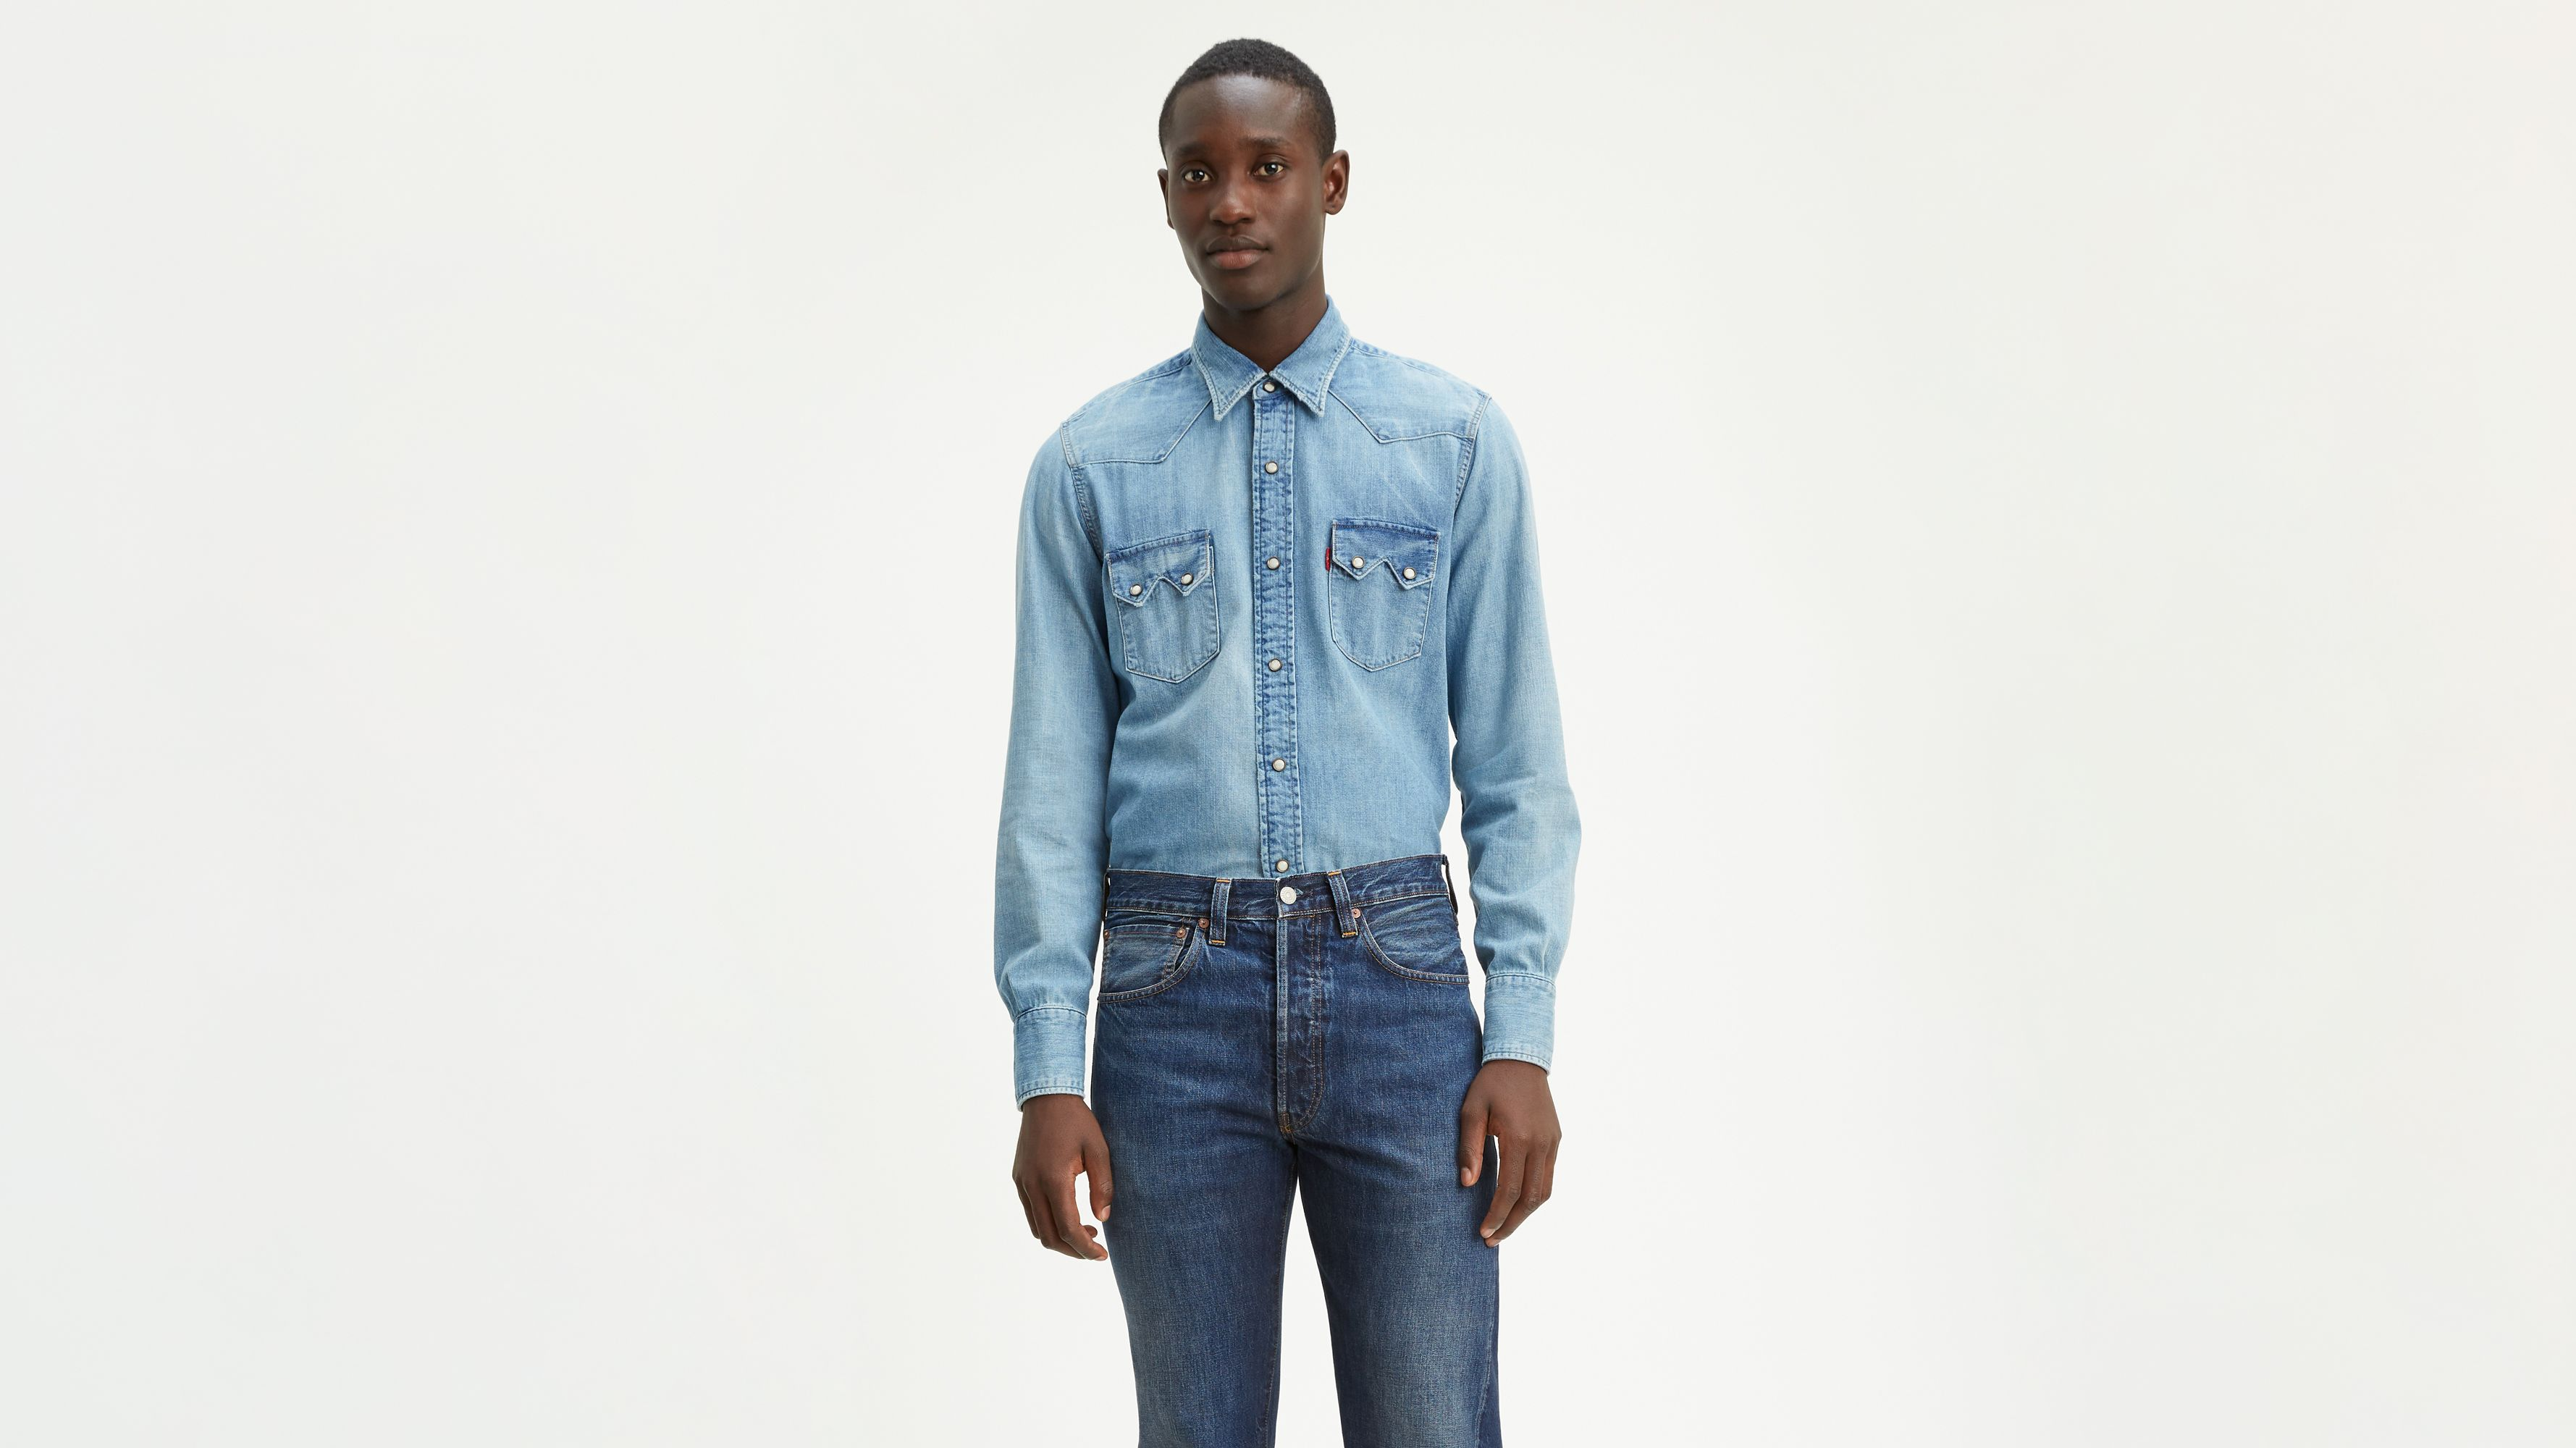 34fcbb4a Levi's® Vintage Clothing 1955 Sawtooth Denim Shirt - Medium Wash | Levi's®  GB